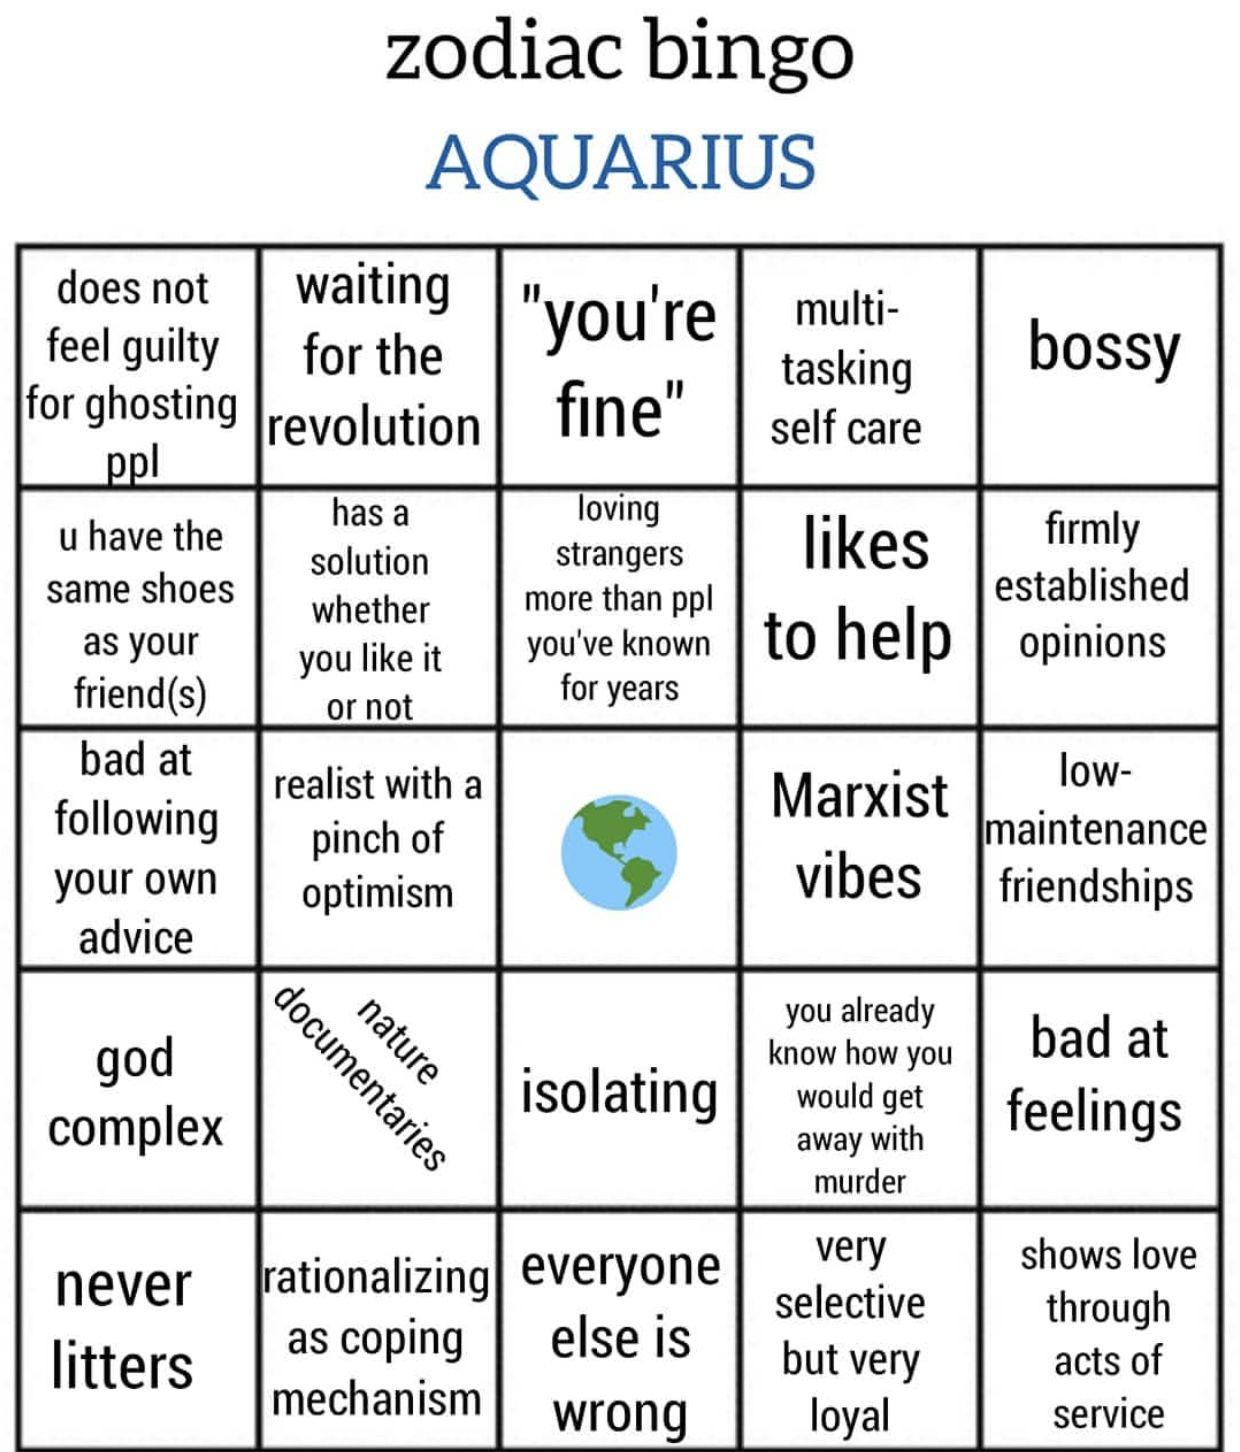 What is an aquarius woman like